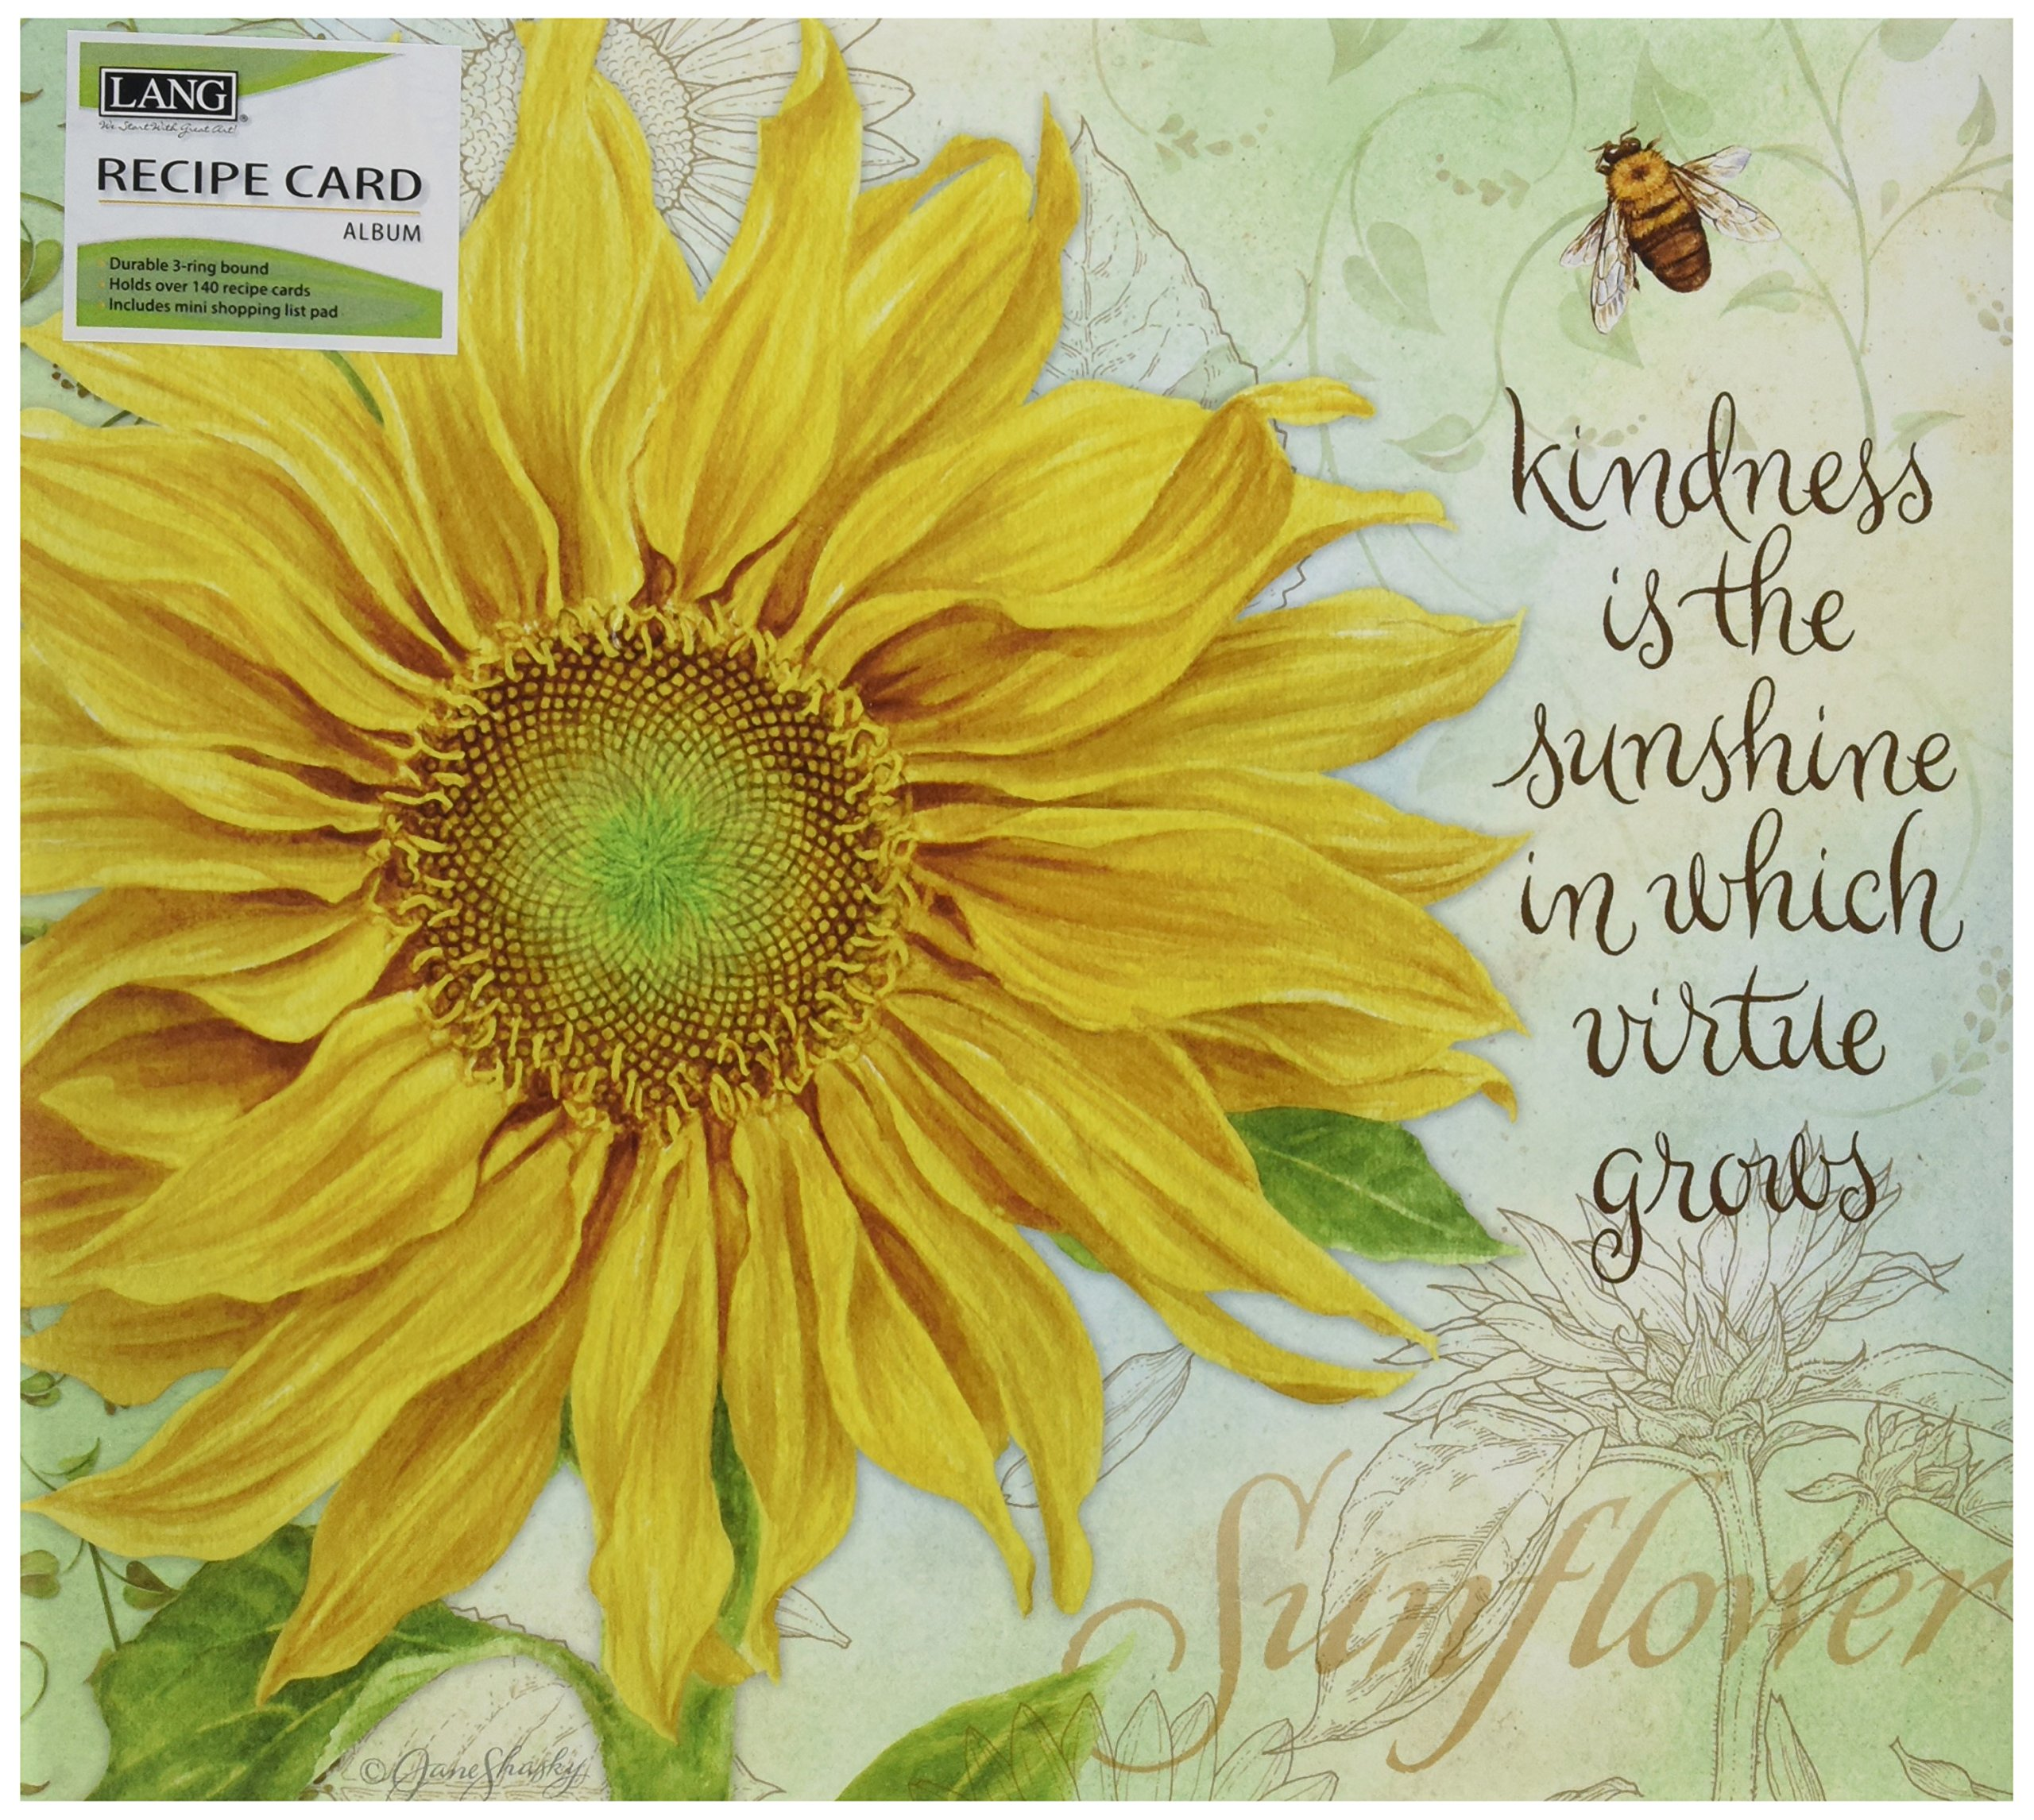 Lang Recipe Card Album, Virtue Grows